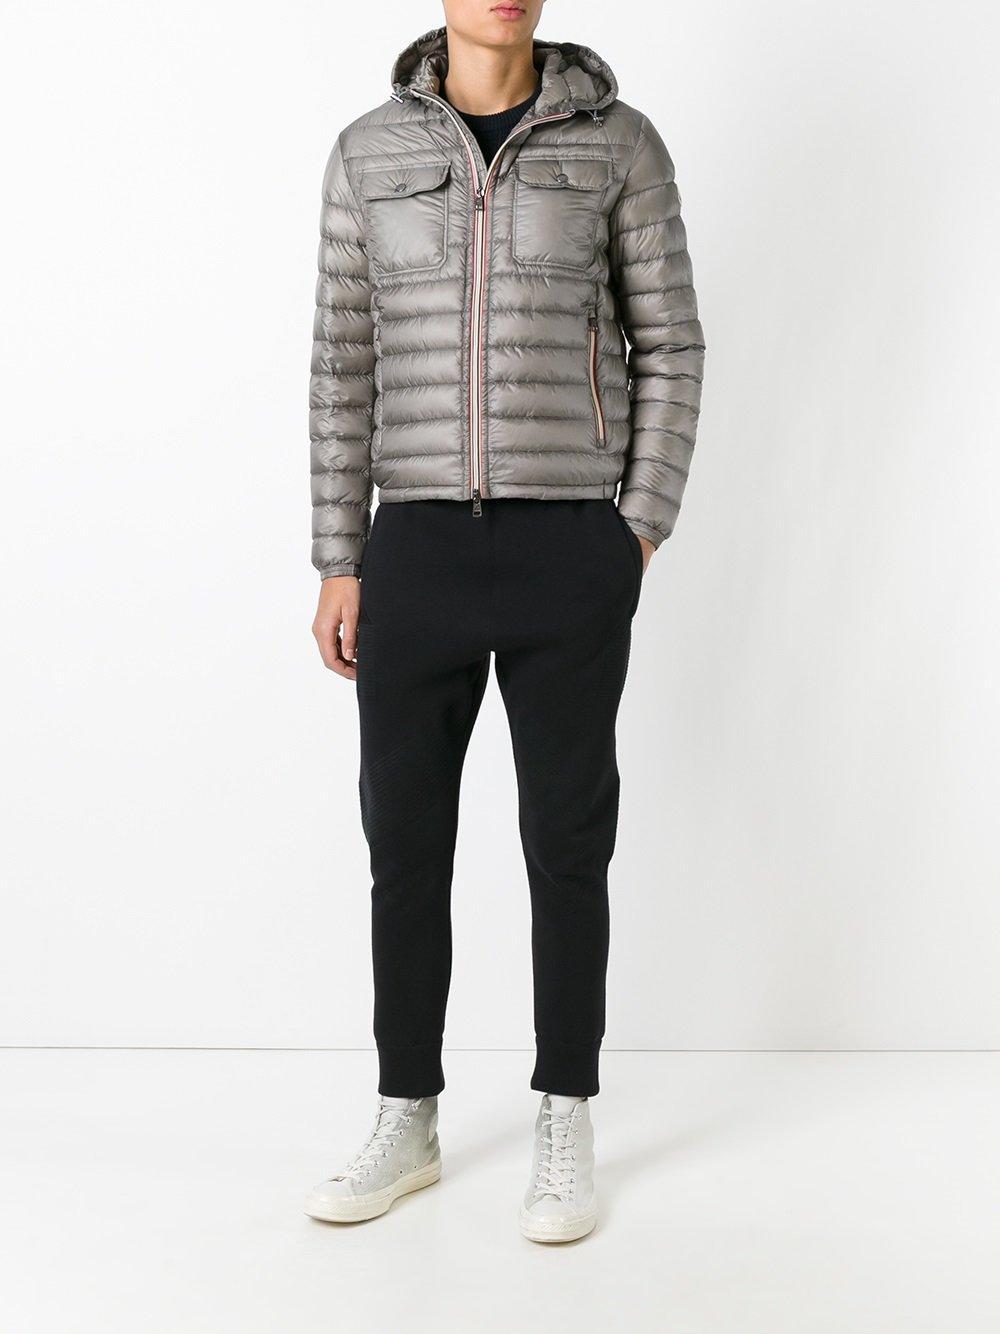 Moncler Douret Padded Jacket In Gray For Men Lyst